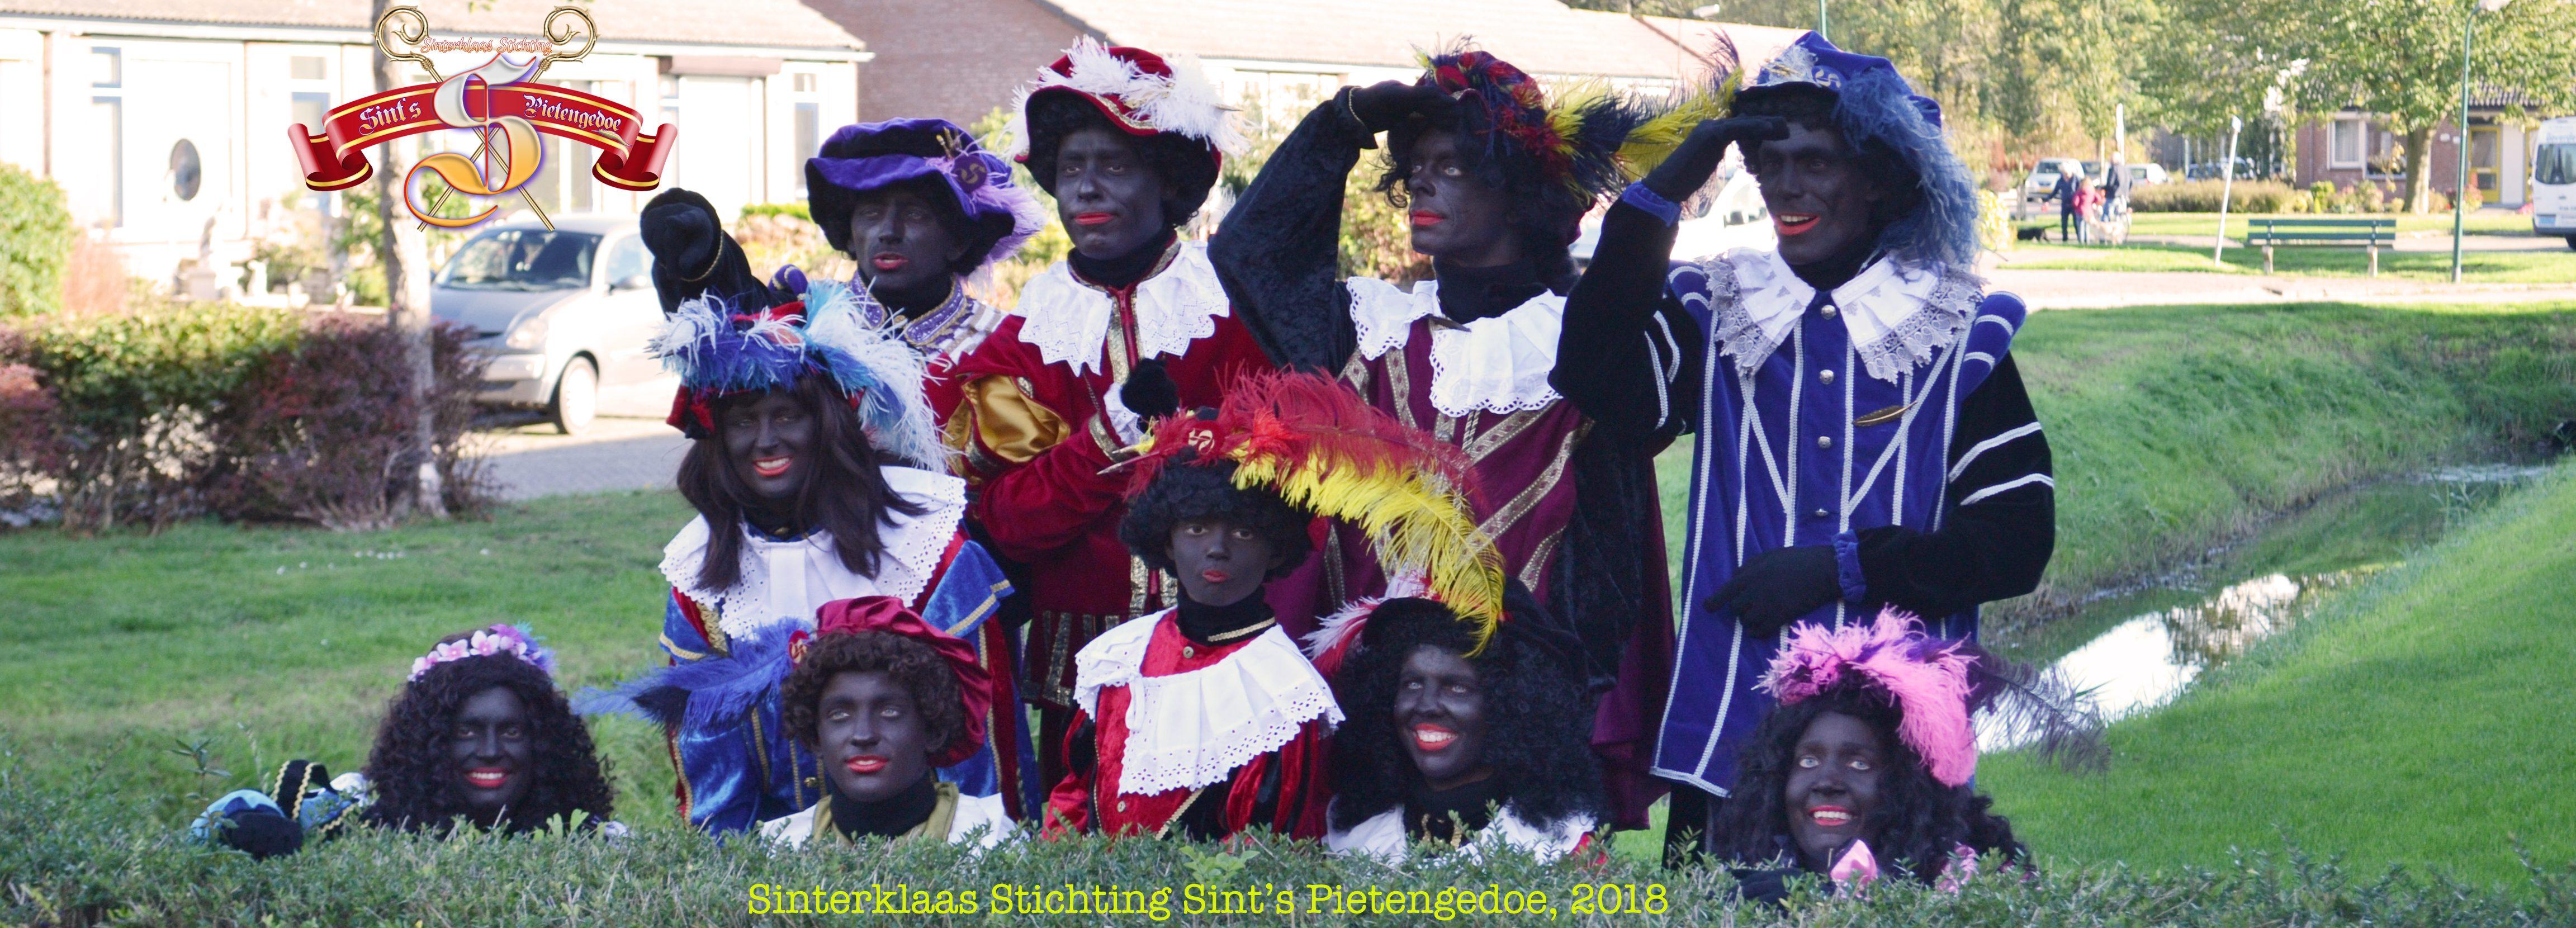 Sinterklaas Stichting Sint's Pietengedoe